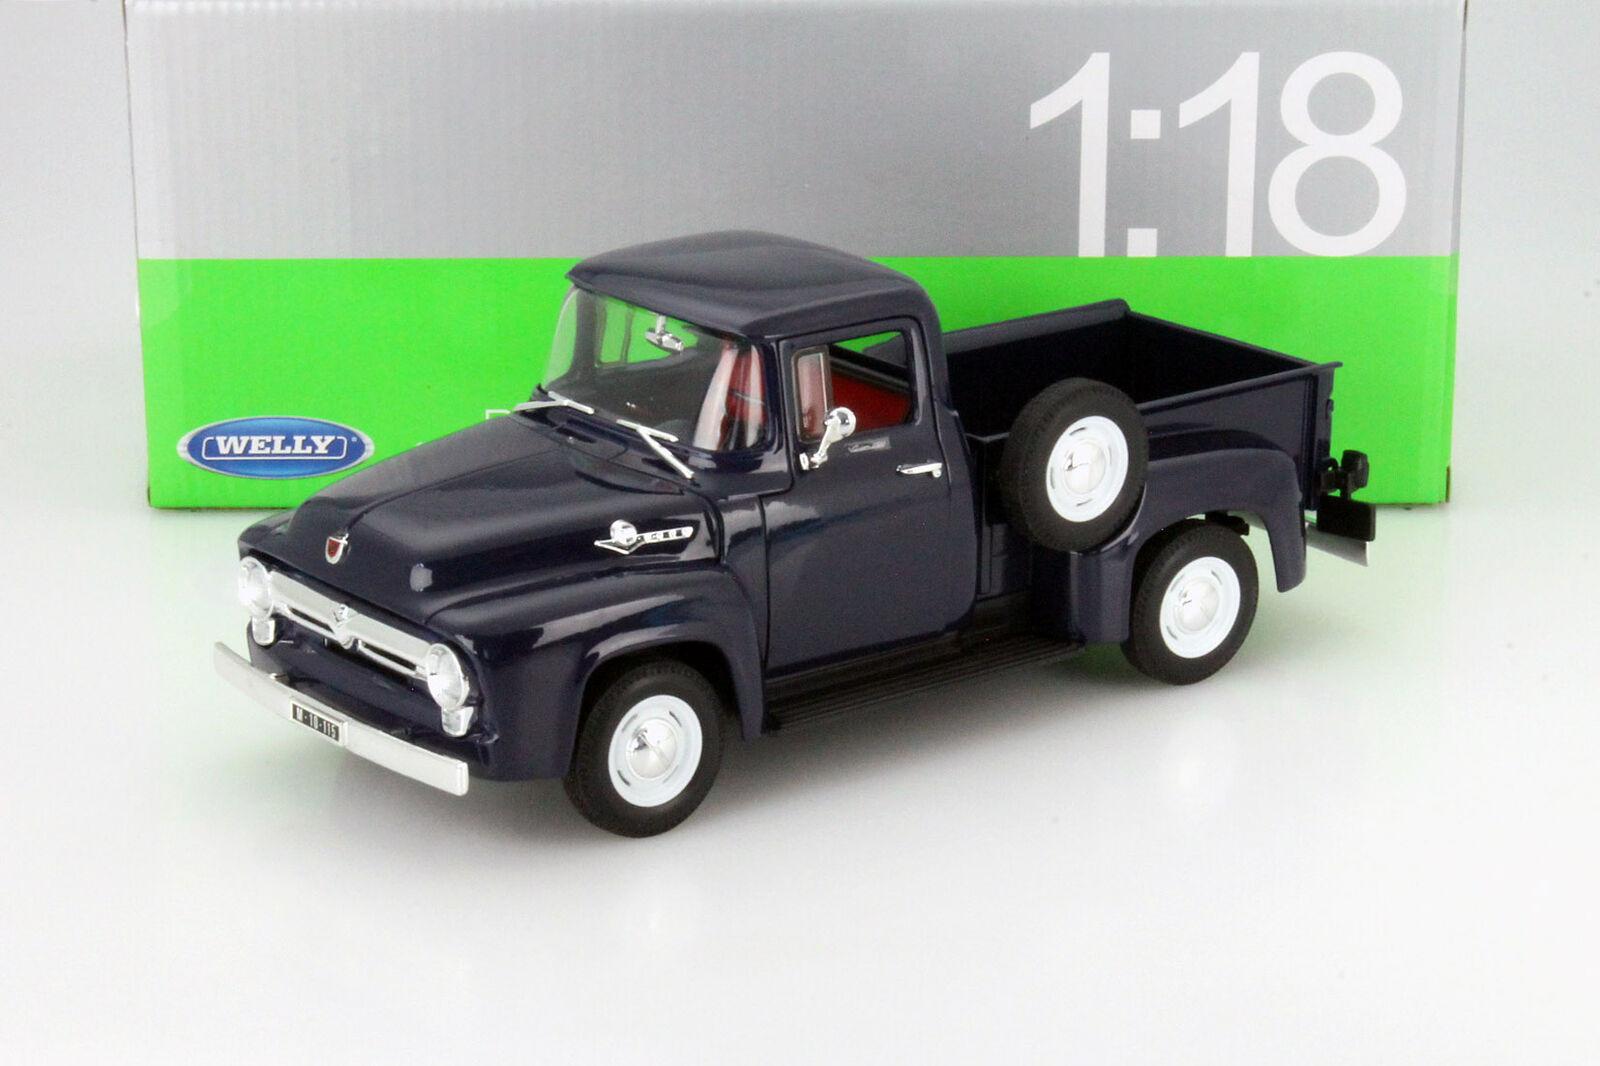 Ford F 350 Pick up schwarz 1999 1:24 Welly  Modellauto 22081